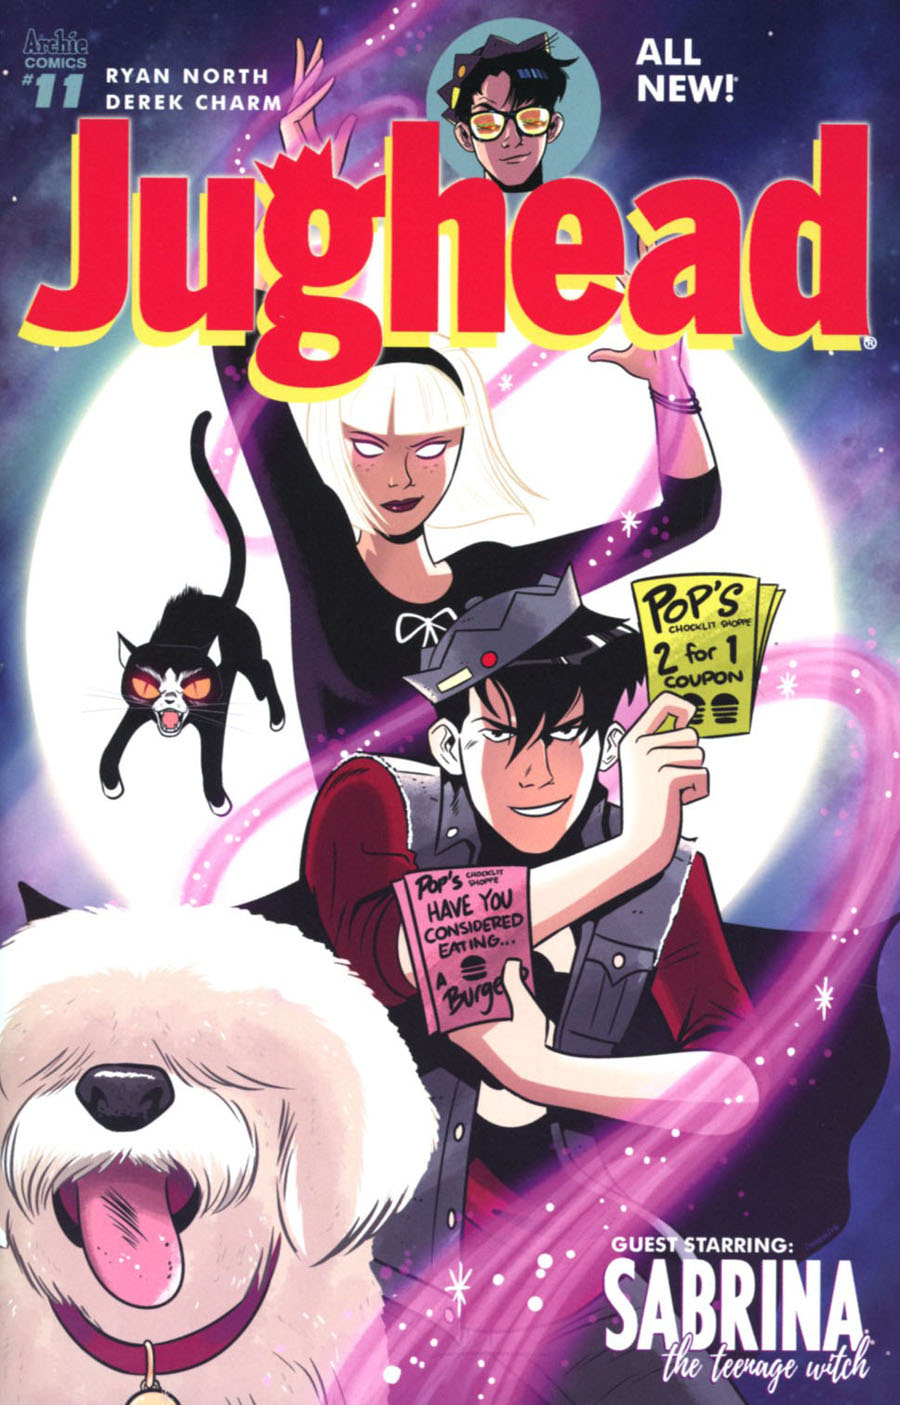 Jughead Vol 3 #11 Cover A Regular Derek Charm Cover